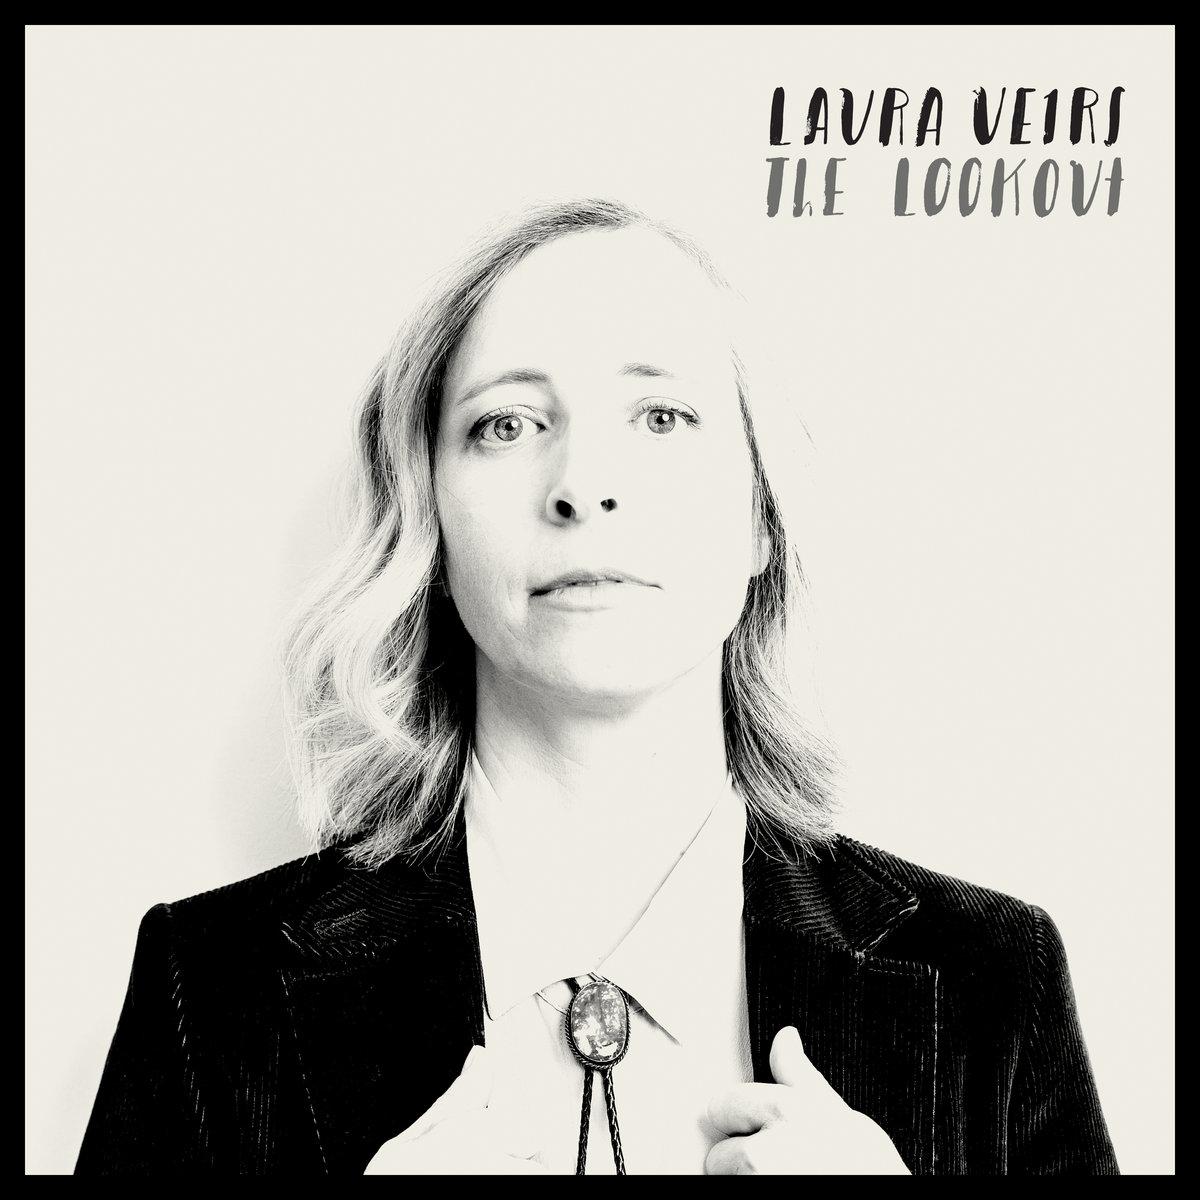 Laura veirs.jpg